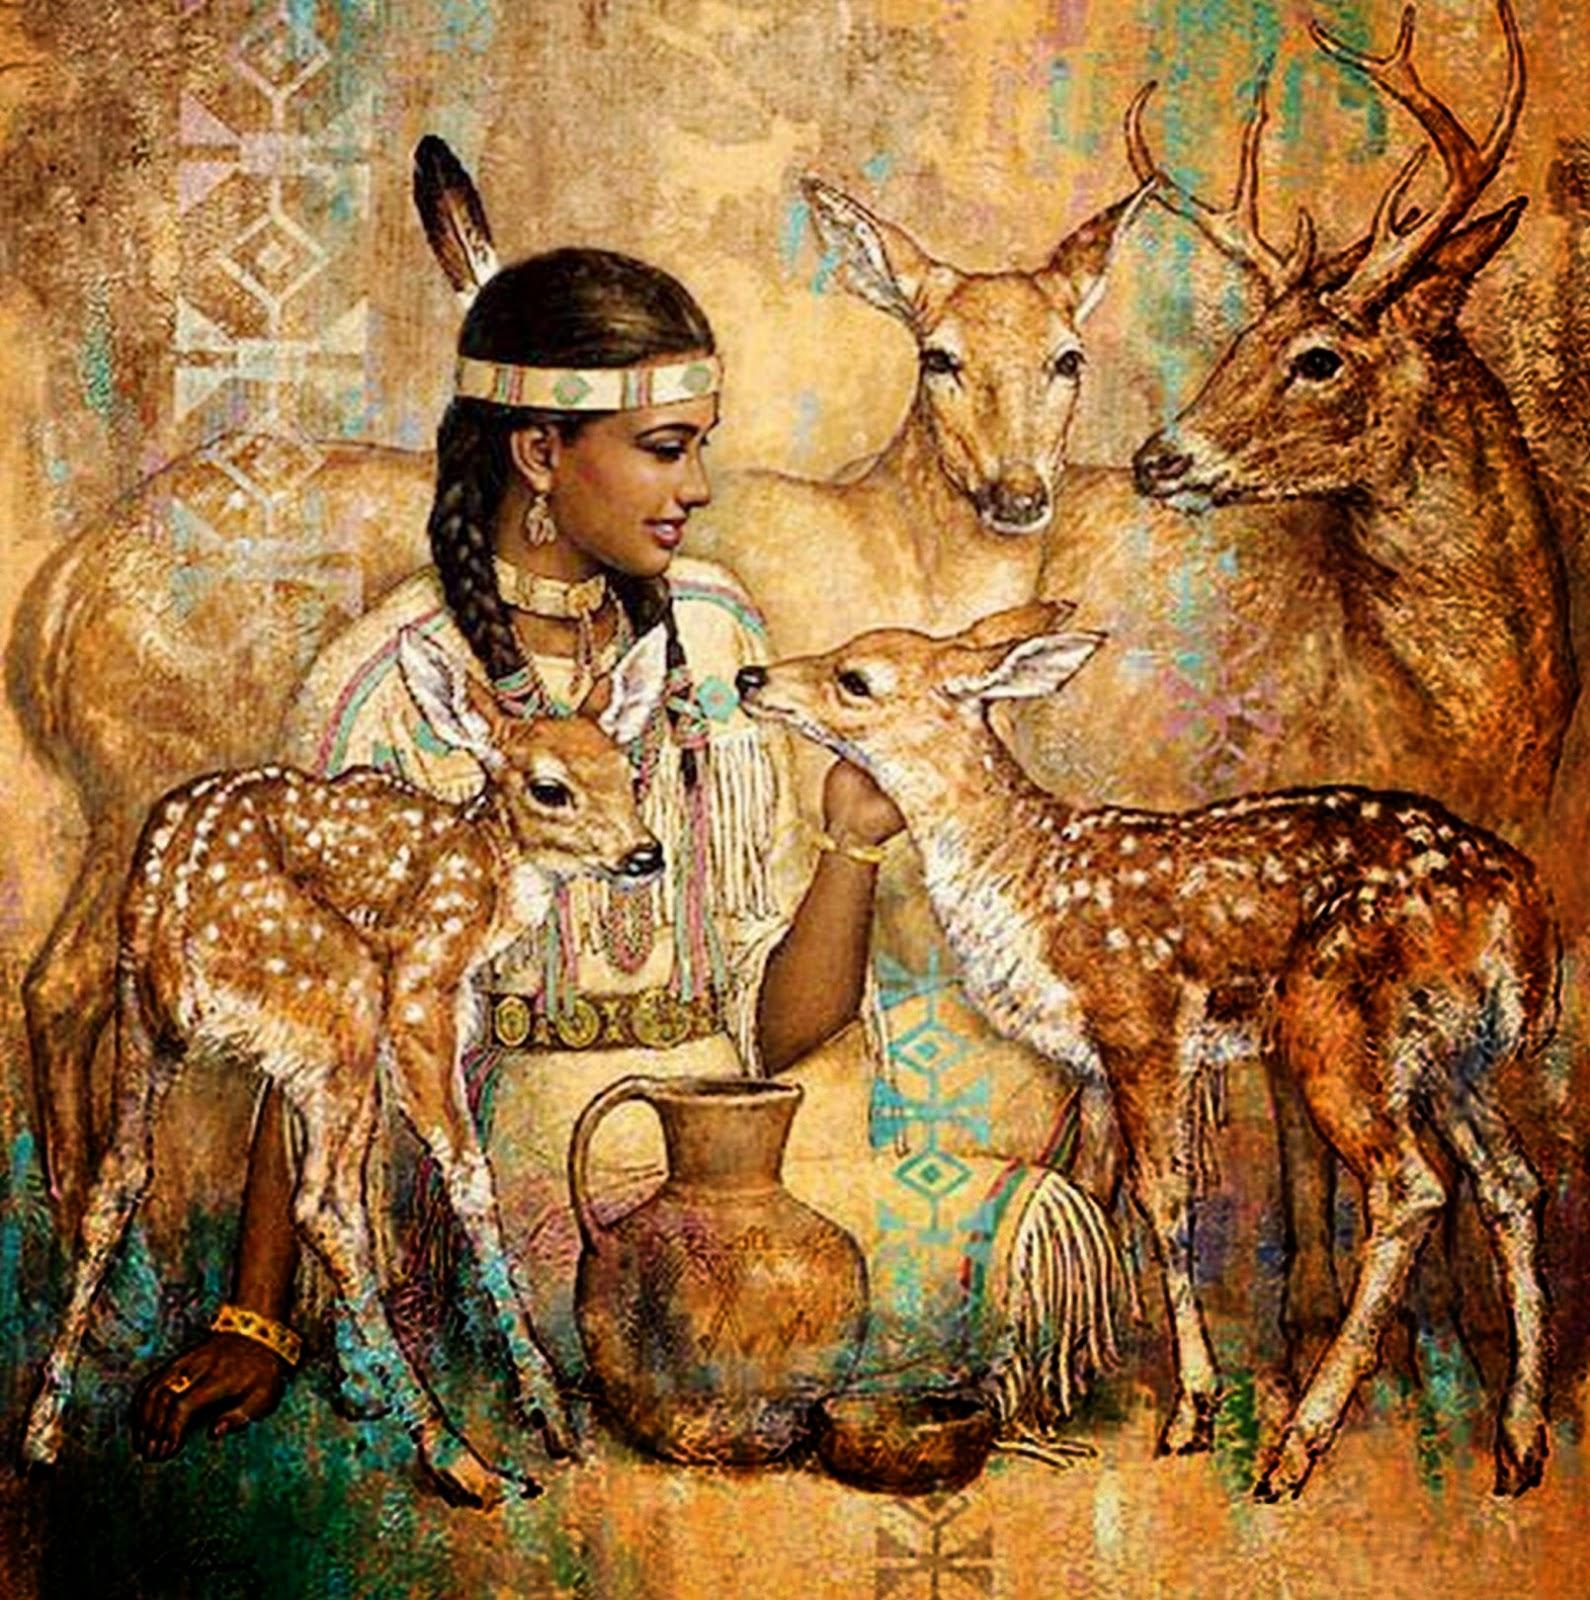 animales-africanos-cuadros-oleos